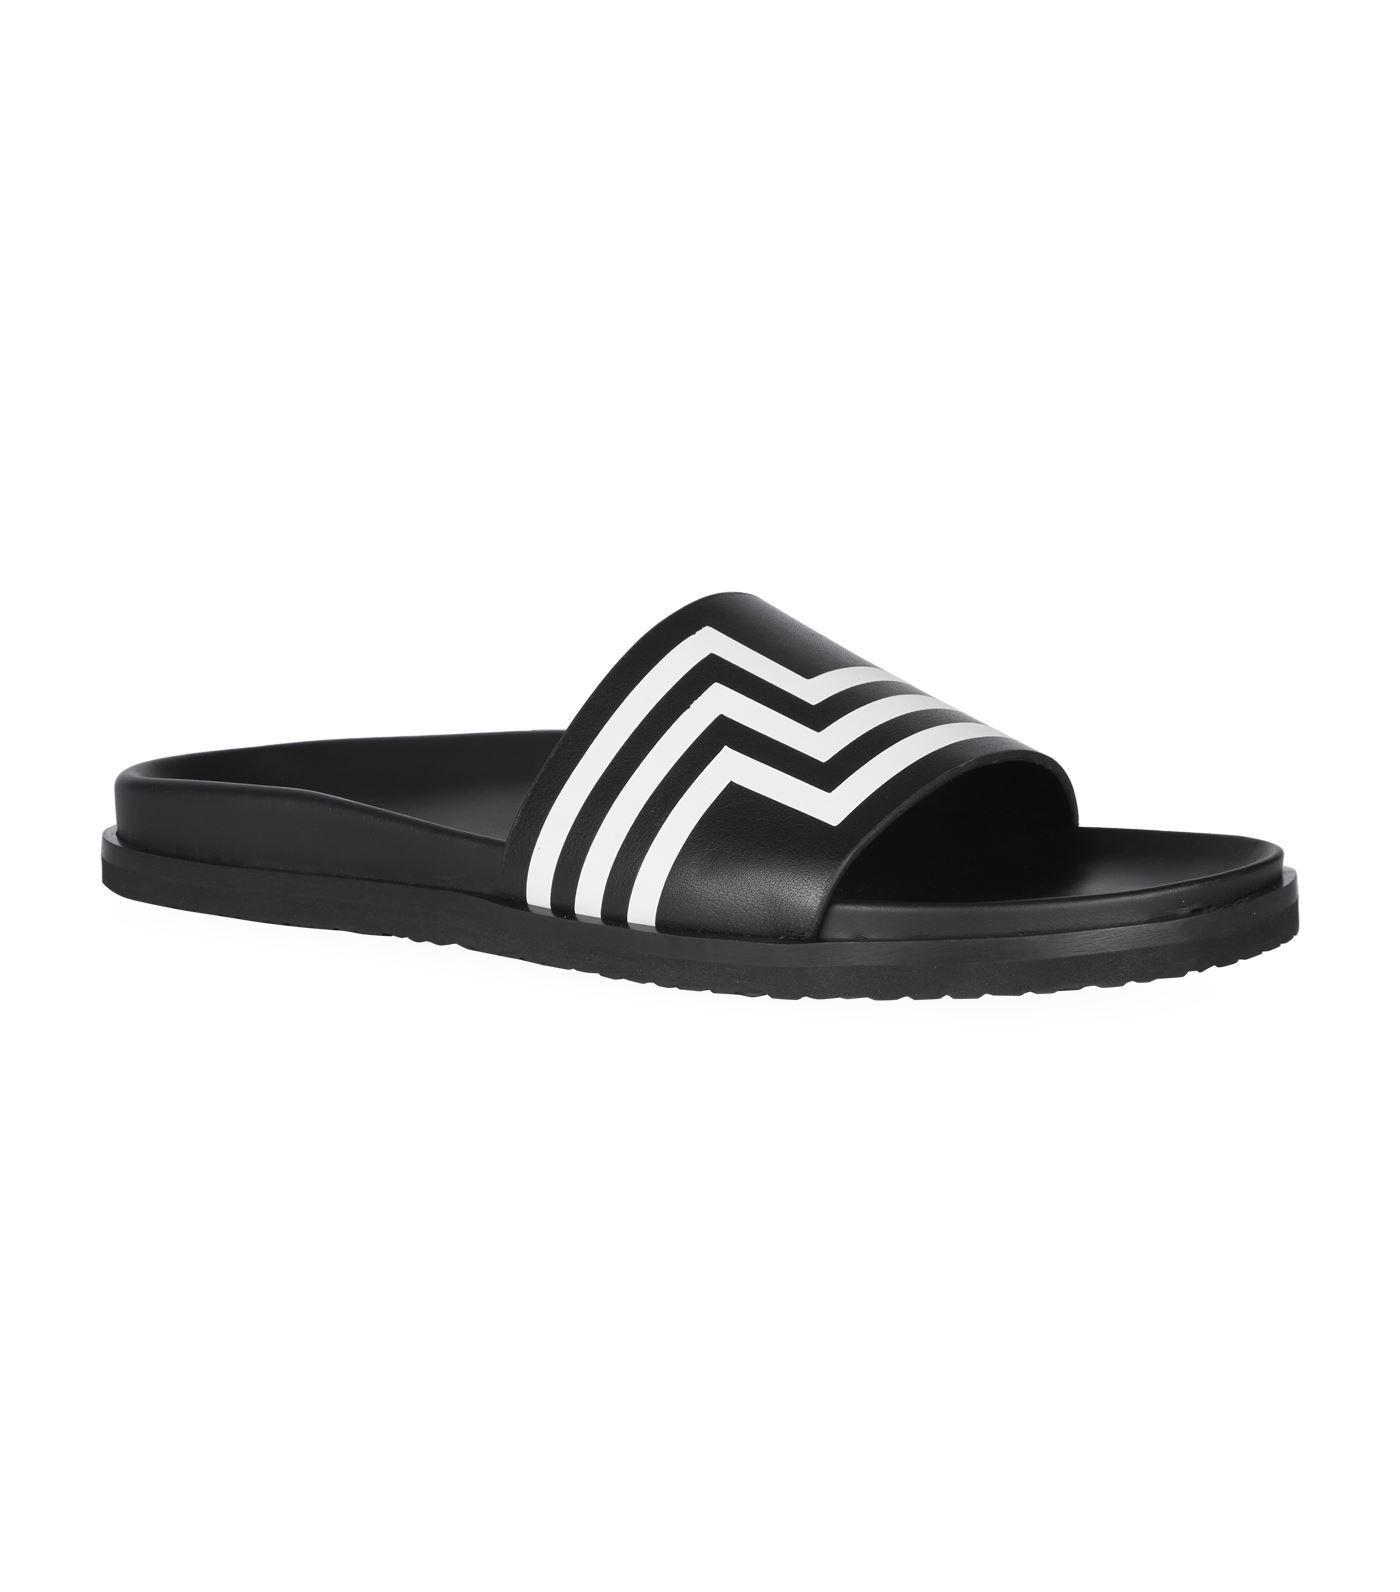 Ralph Lauren Lauren Lauren viola Label Massai Striped Leather Slides Sandals New  295 8f539e